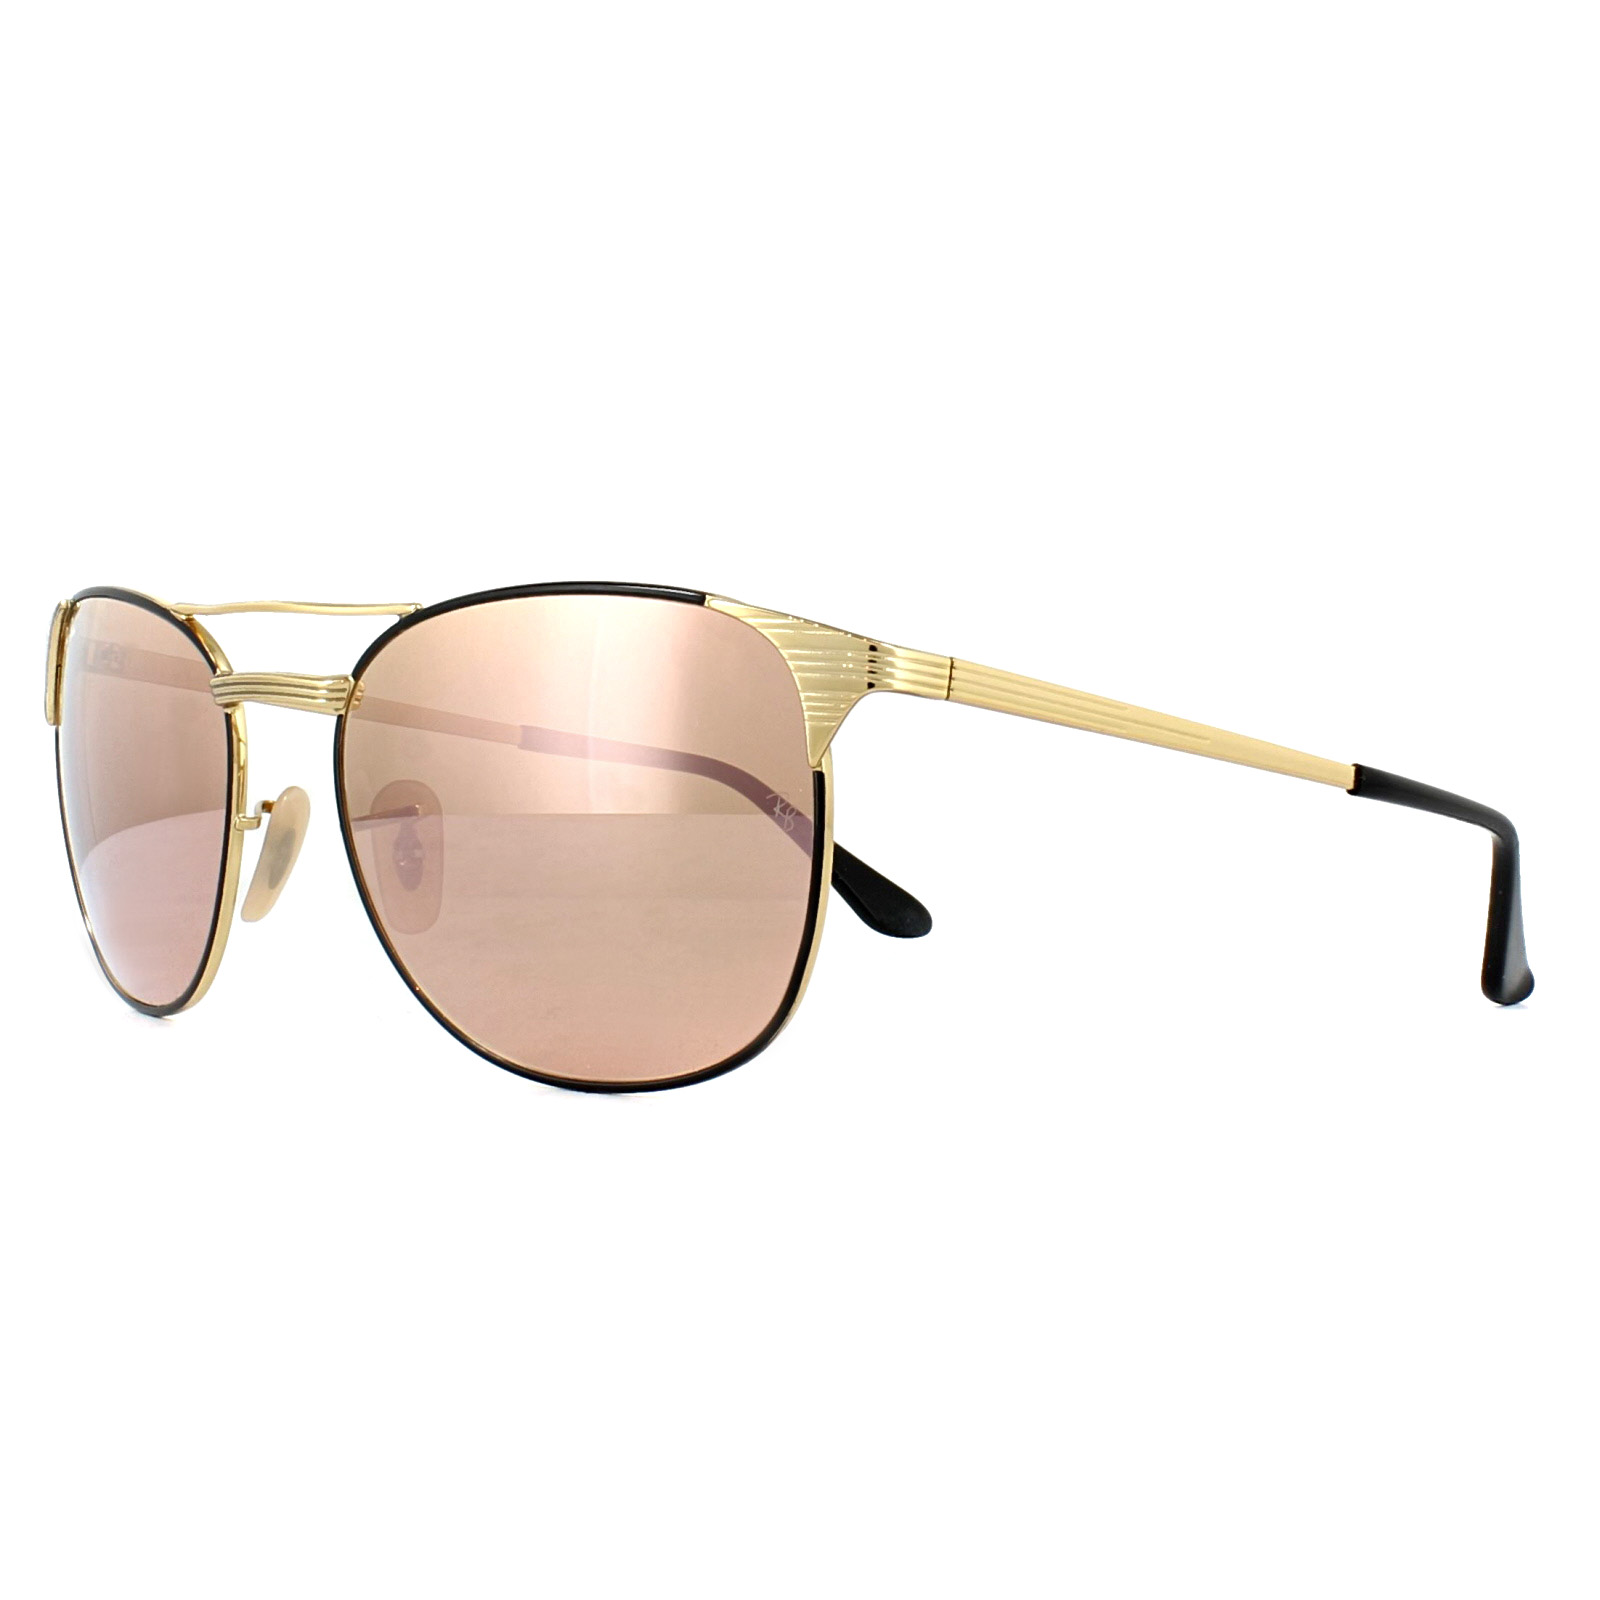 bd0f4994d51 Sentinel Ray-Ban Sunglasses Signet 3429M 9000Z2 Black Gold Copper Mirror